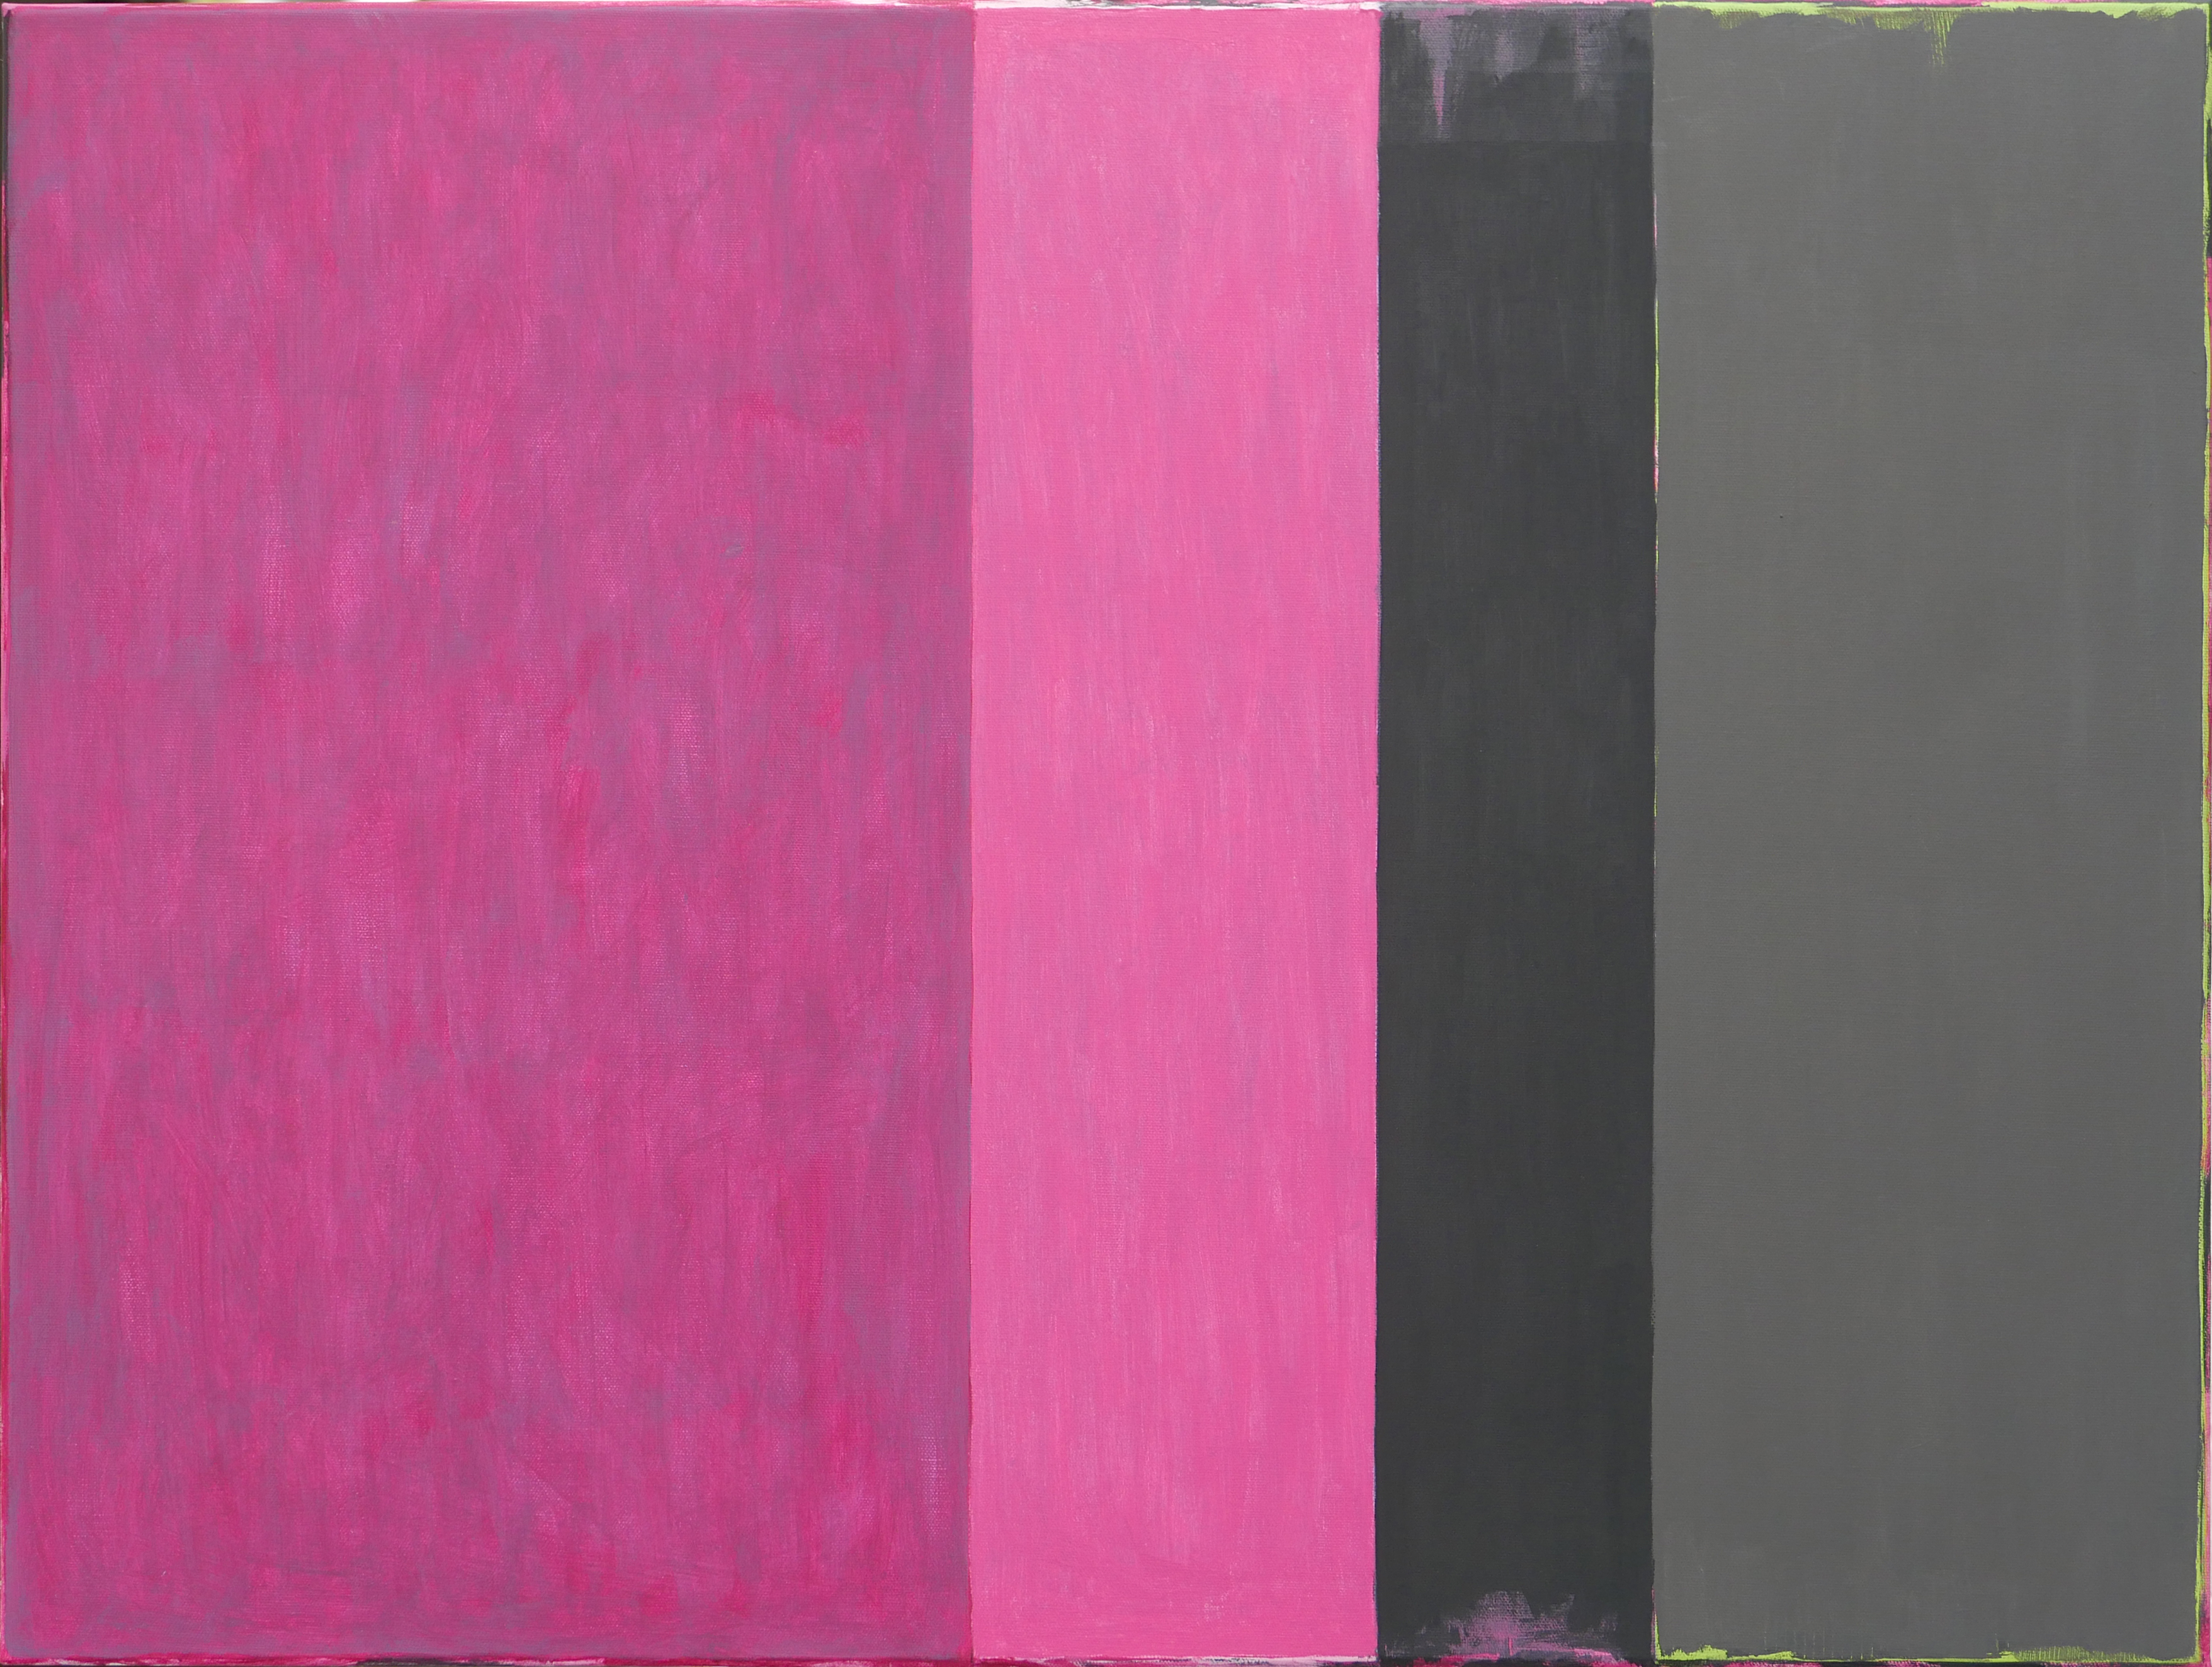 Equinox. Acrylic on canvas, 600 X 600